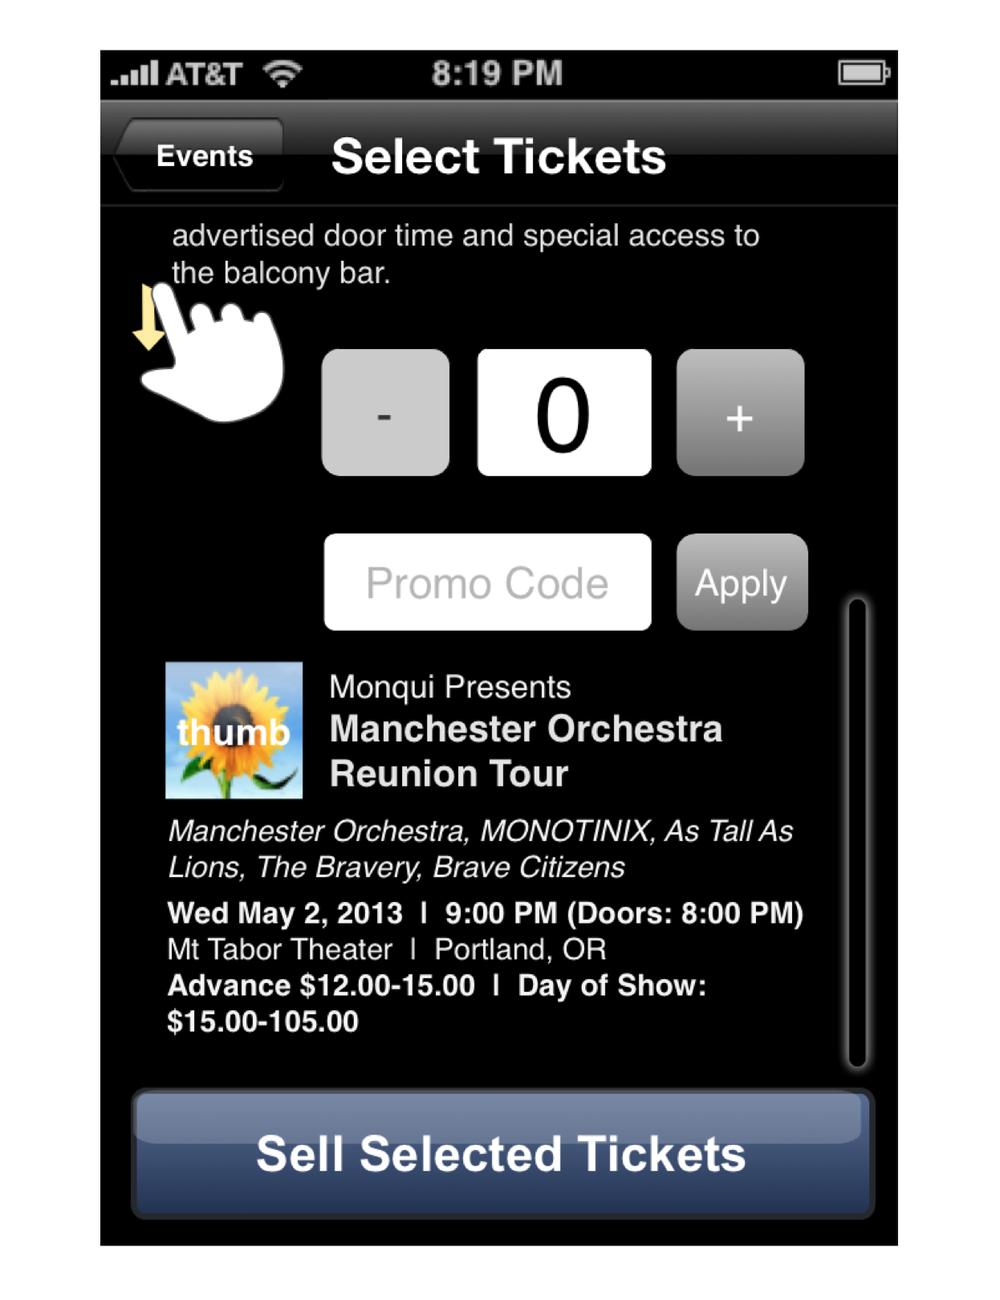 Screenshot 2014-08-08 17.02.25.png